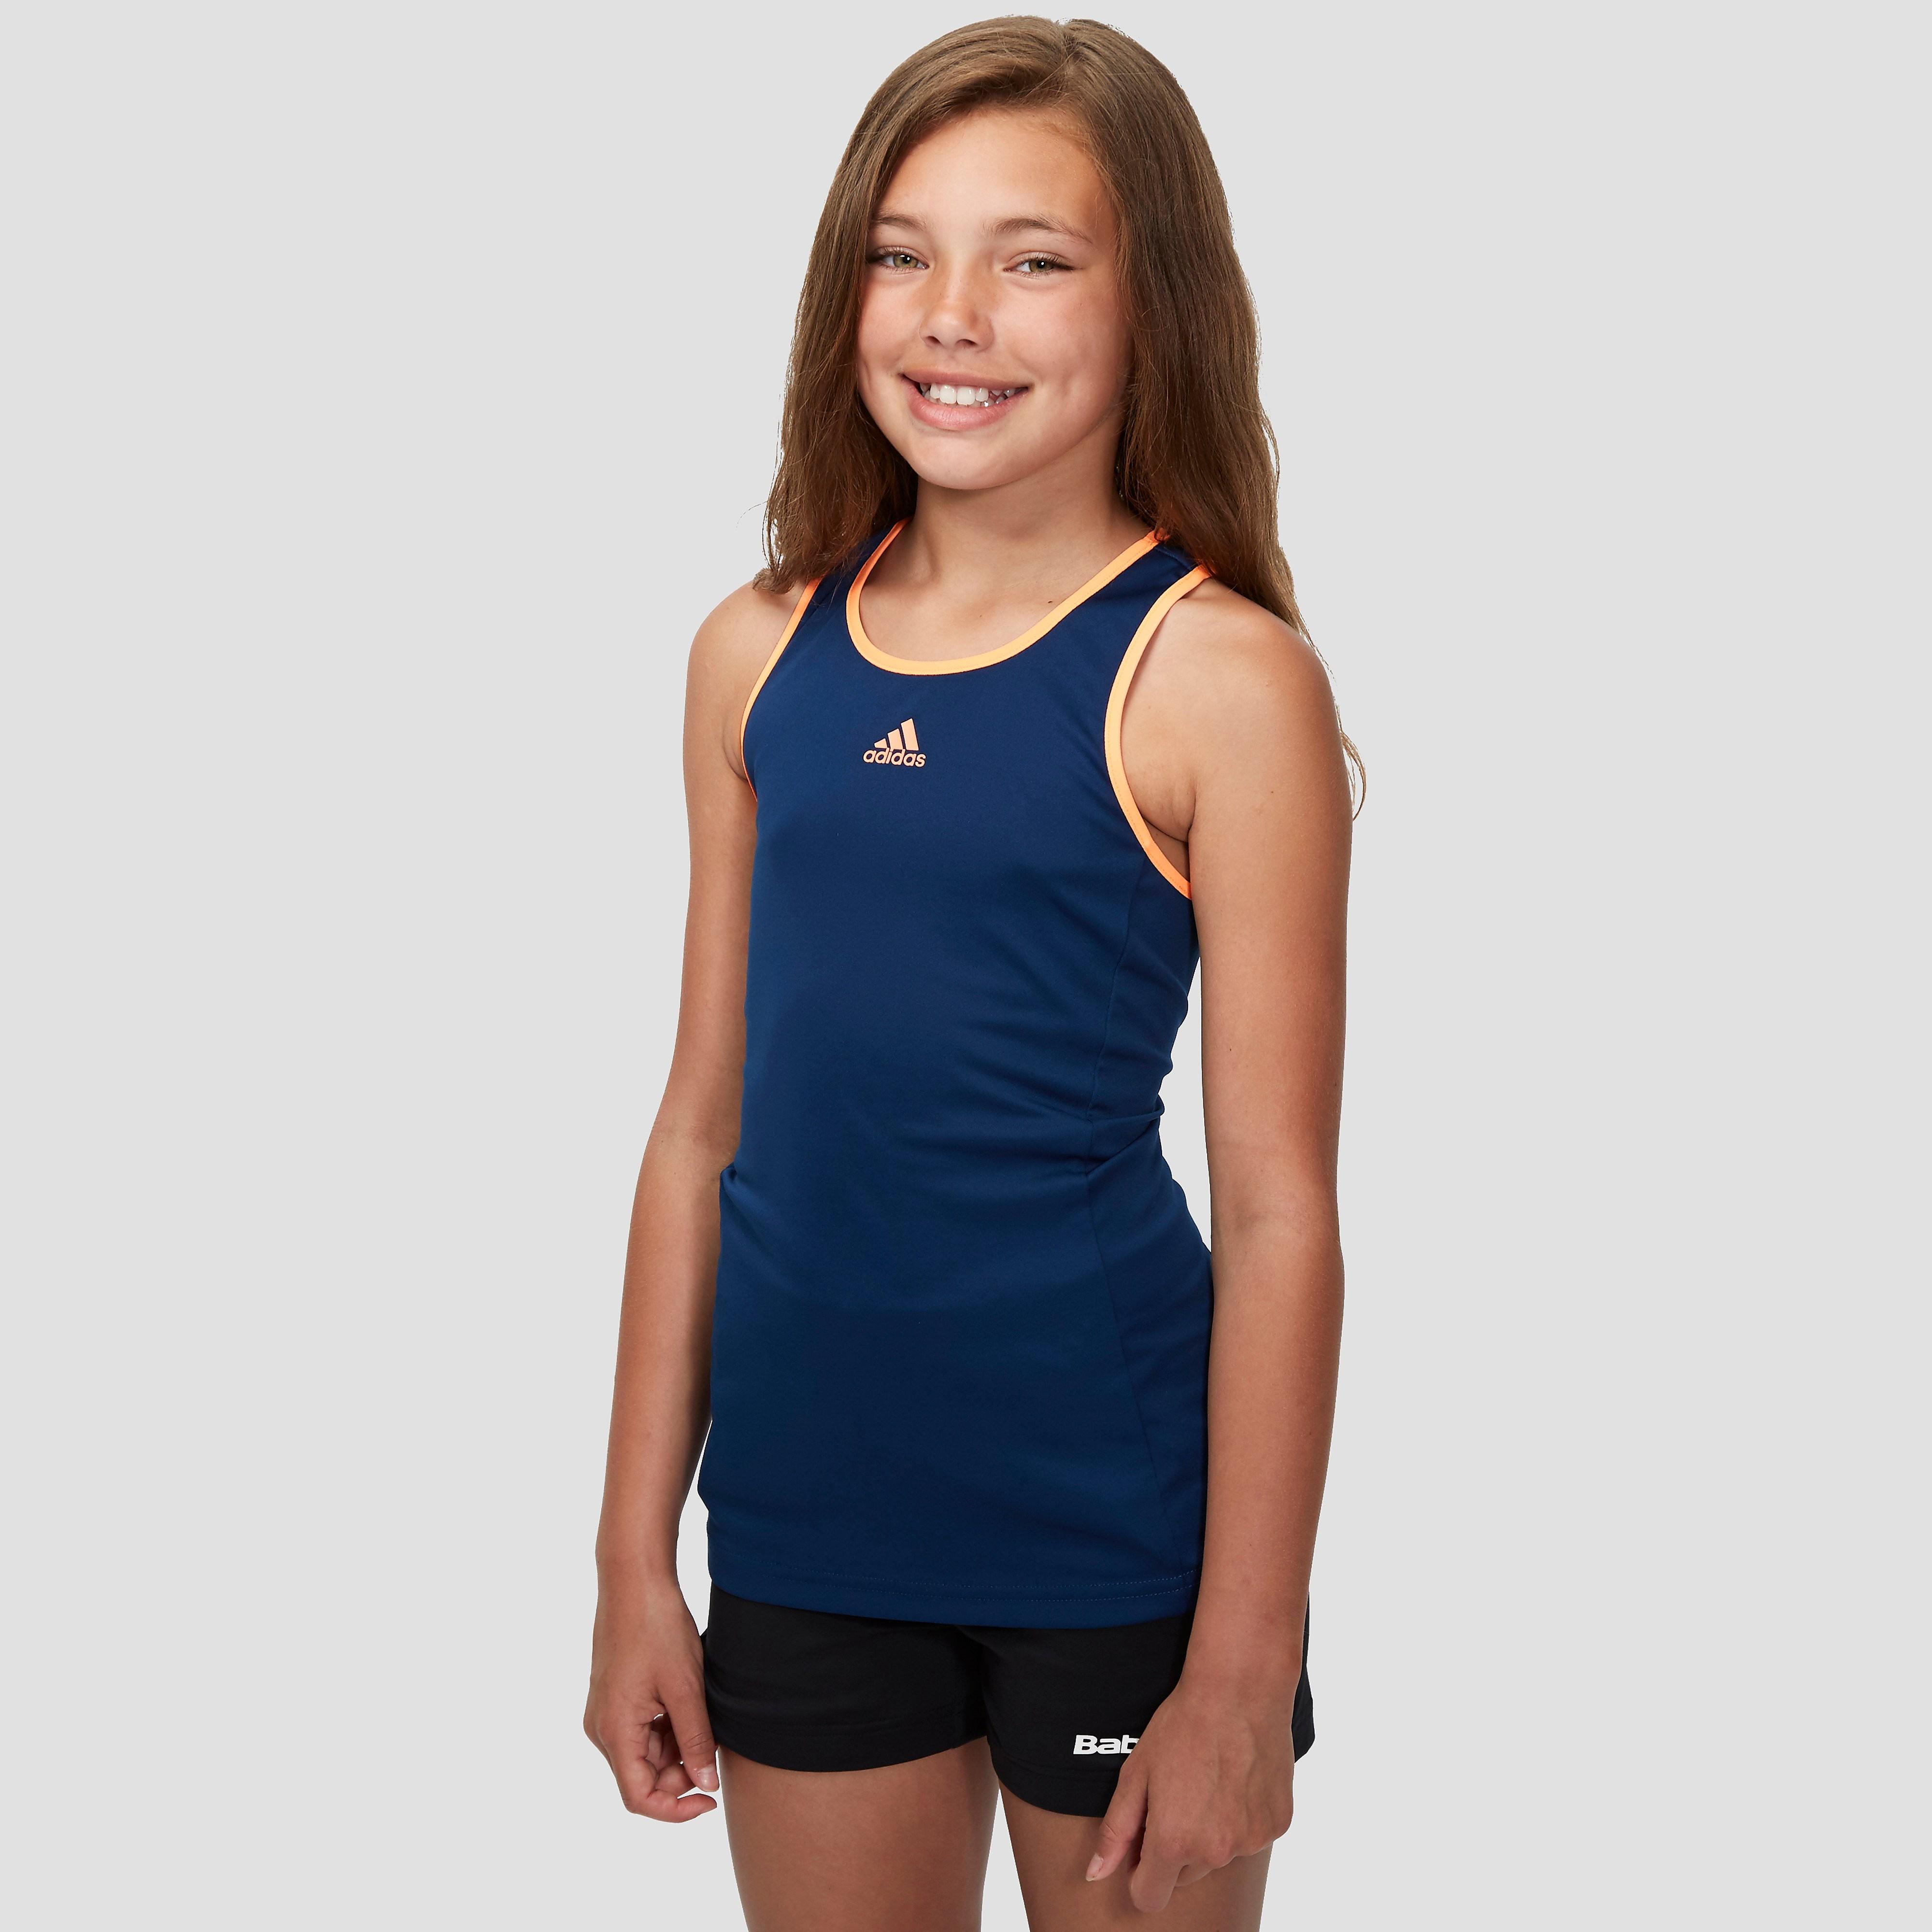 adidas Melbourne Girl's Tennis Tank Top